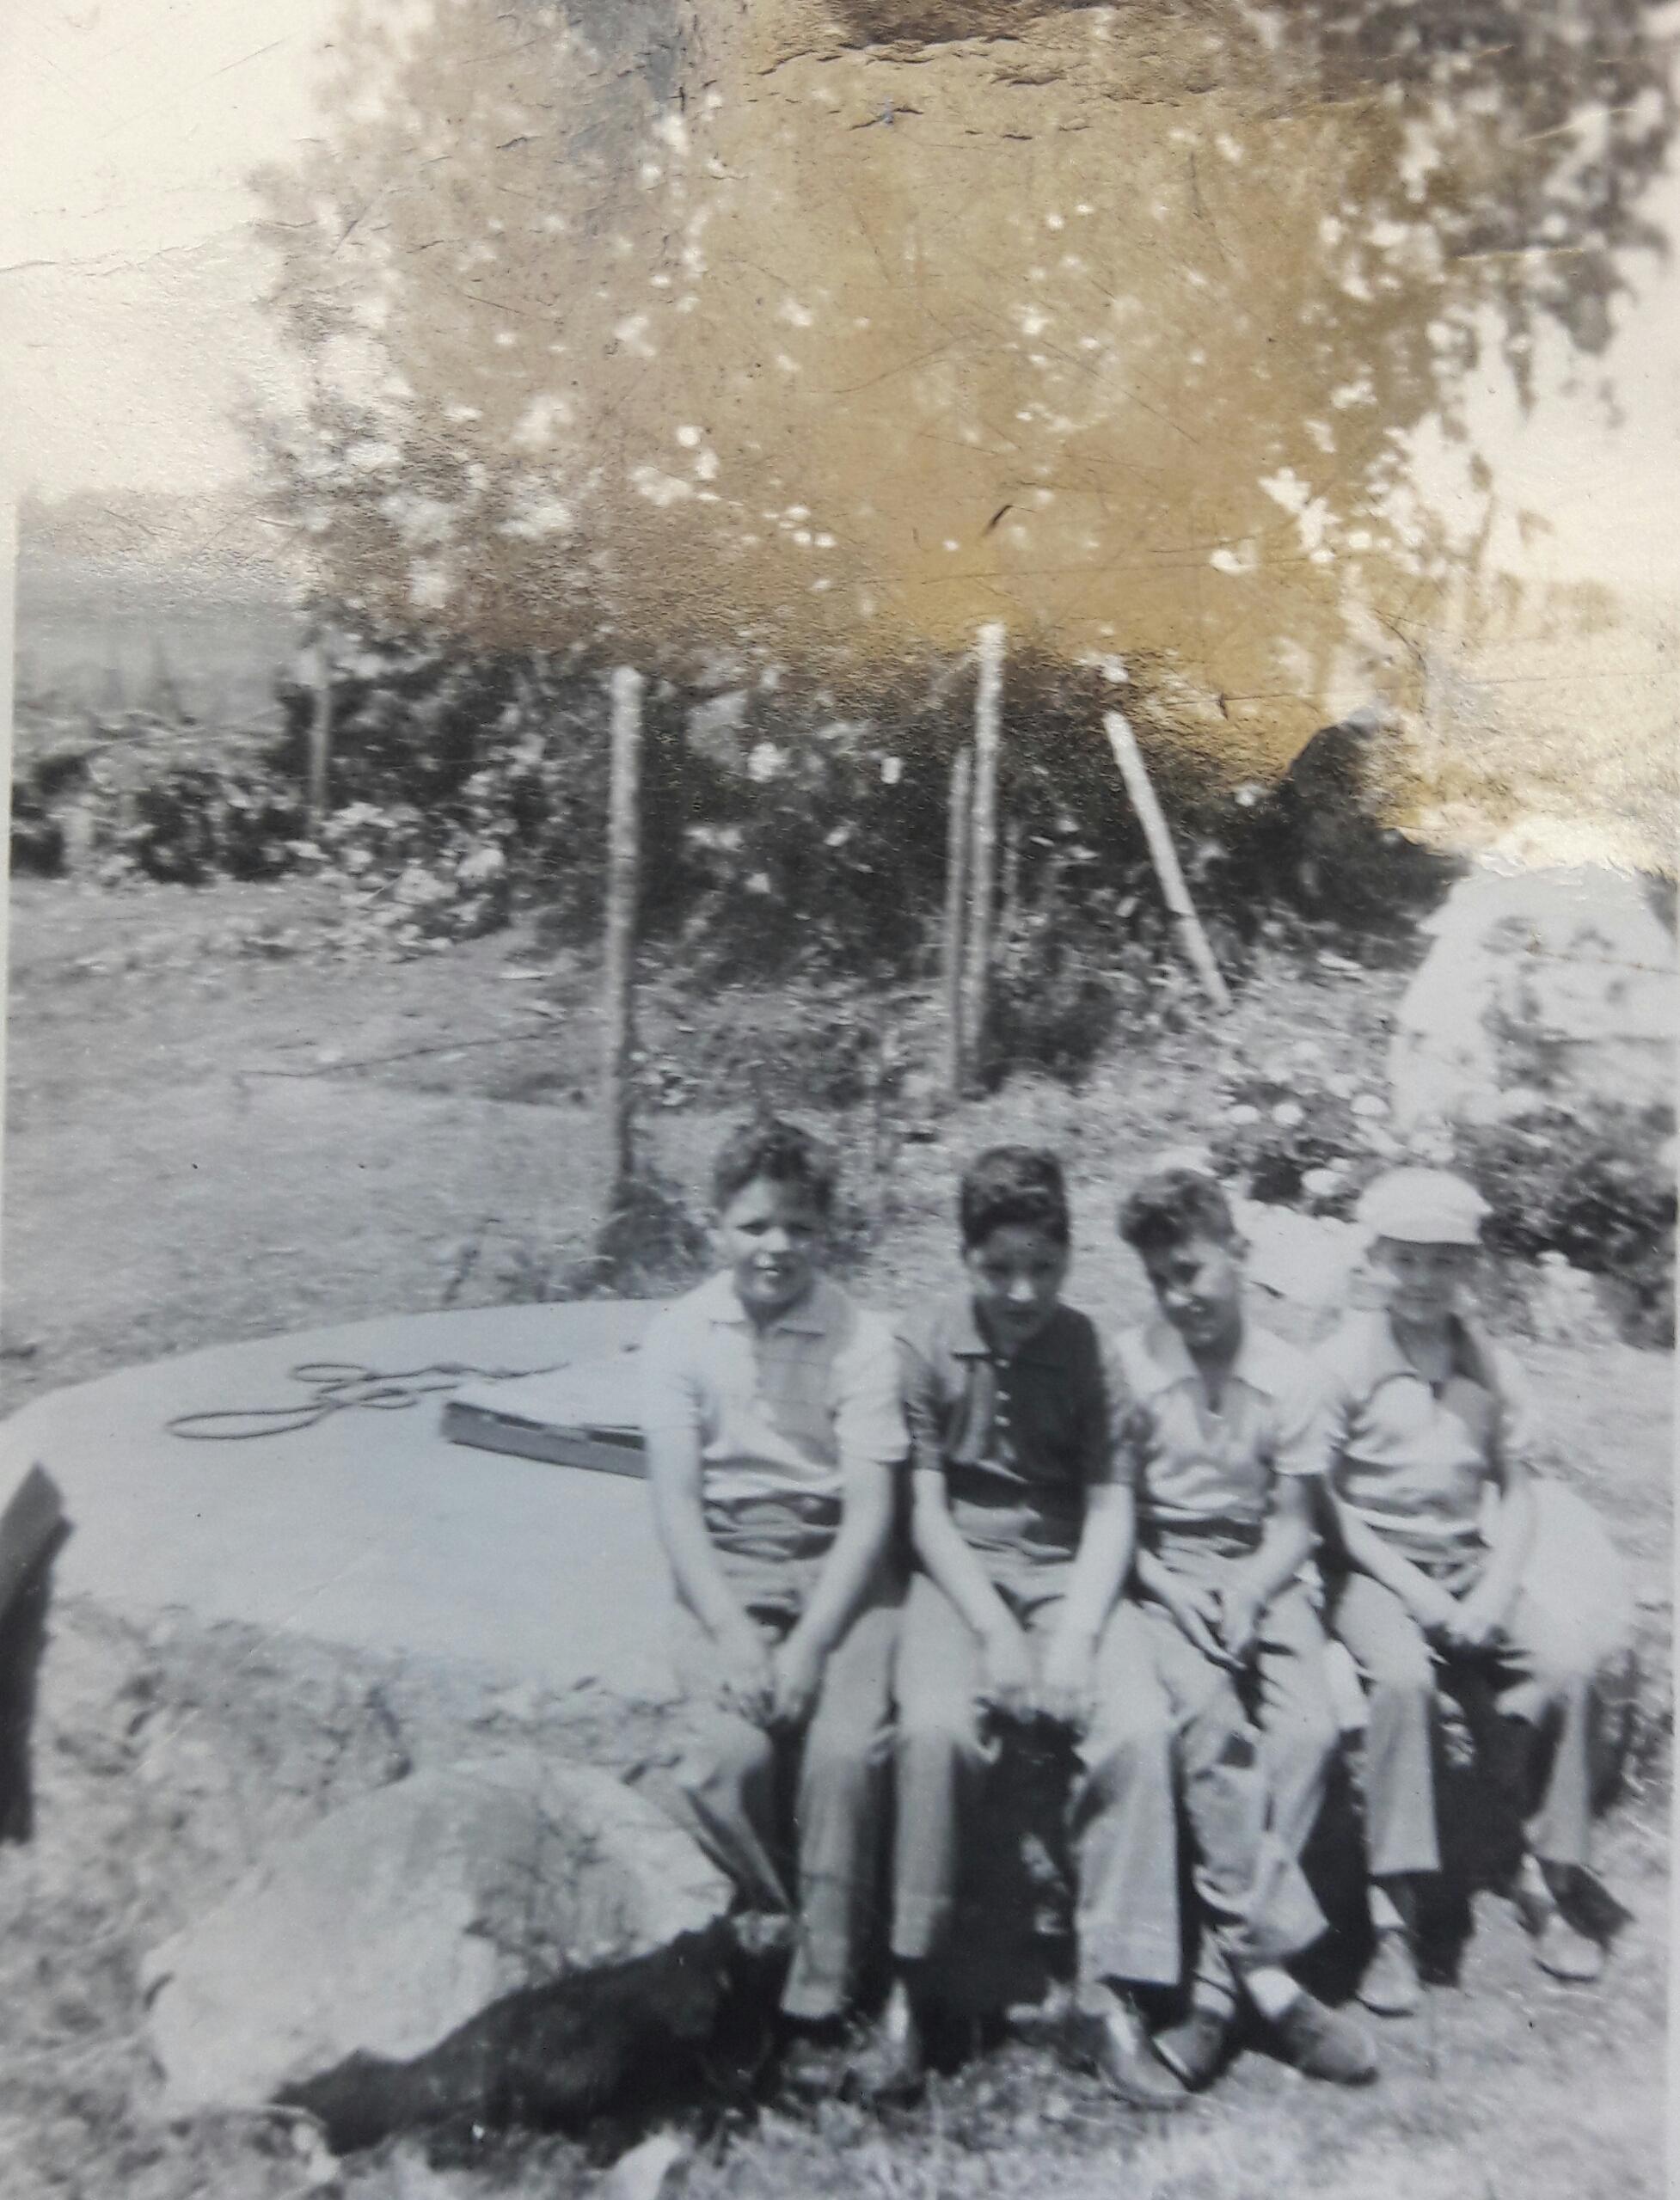 Enterreno - Fotos históricas de chile - fotos antiguas de Chile - Sector Apoquindo, 1950